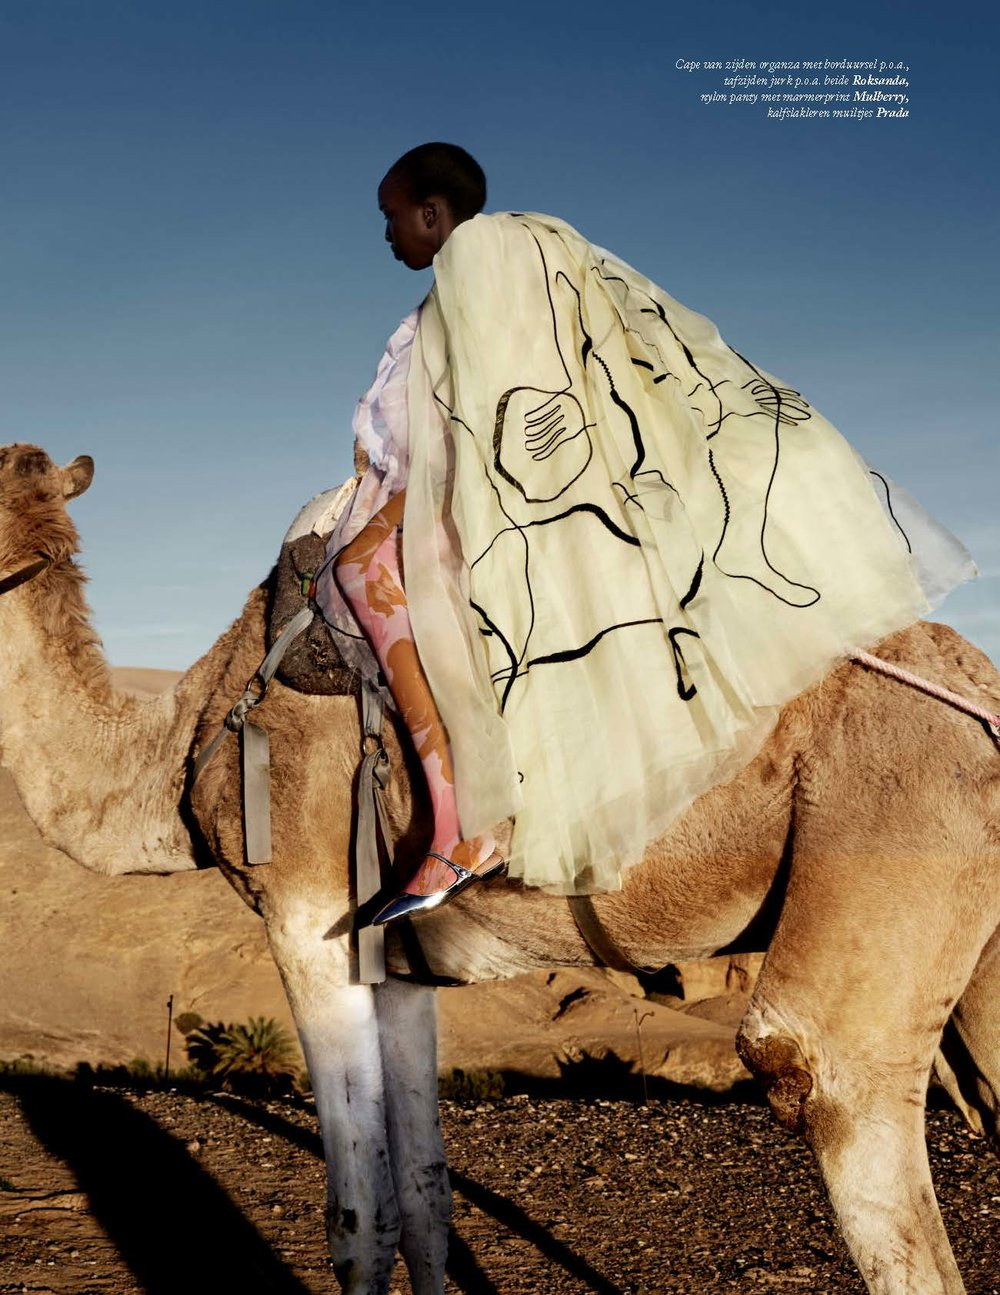 Niko Riam by Carlijn Jacobs for Vogue Netherlands (3).jpg